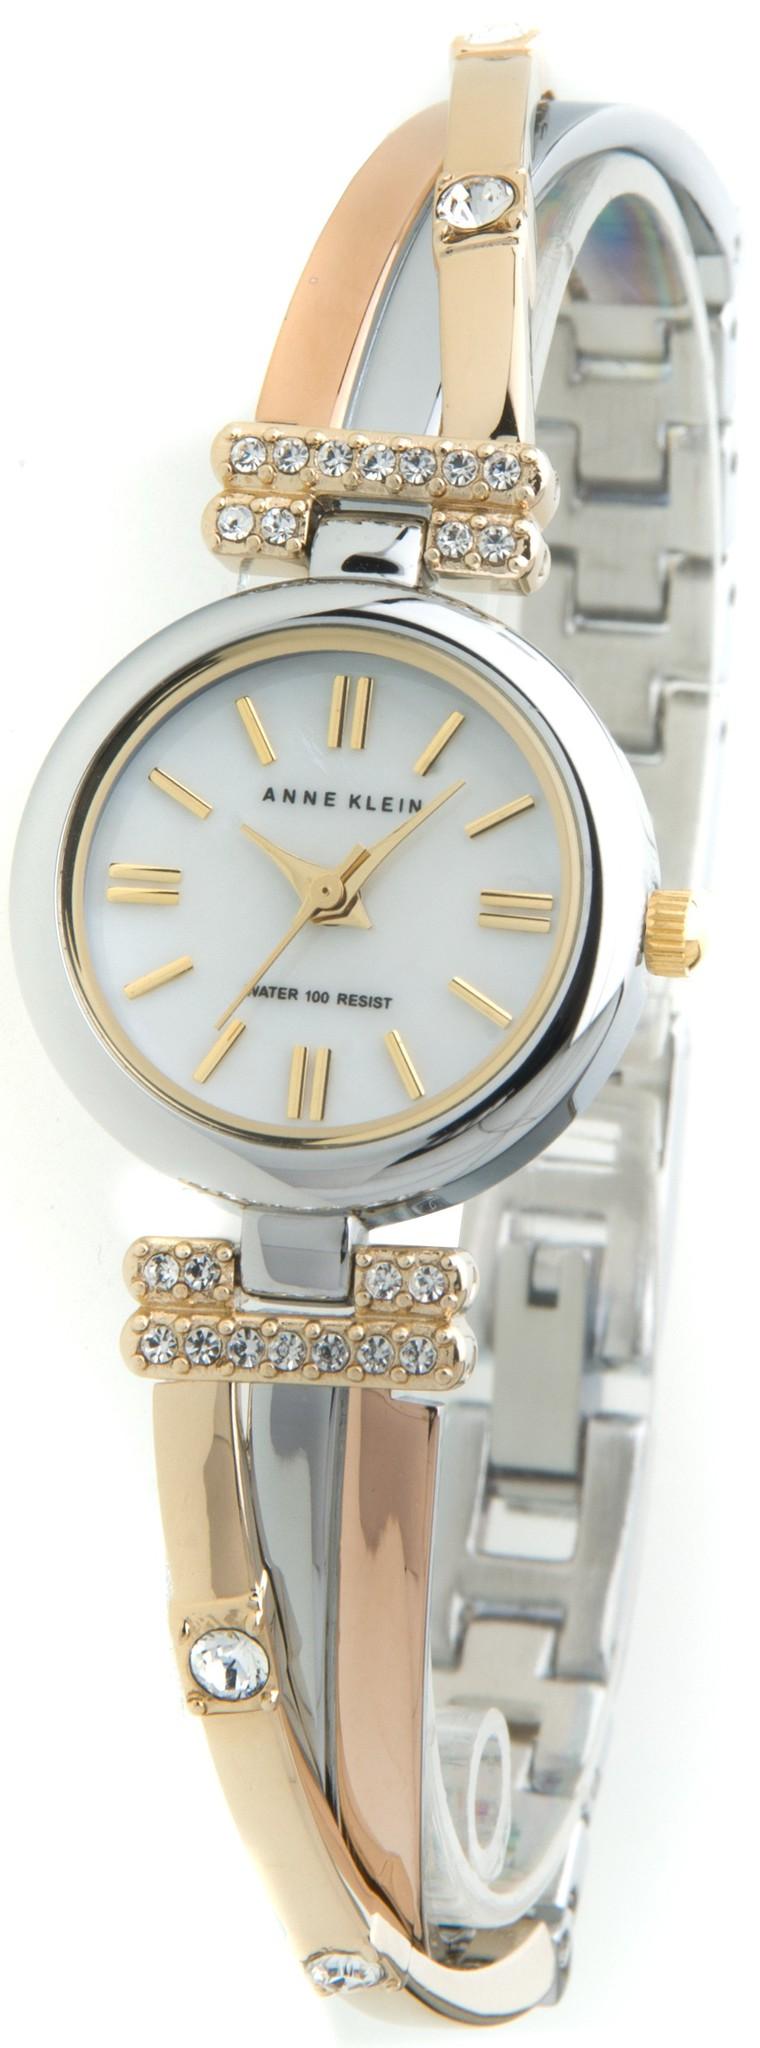 Anne Klein 9479MPTR - женские наручные часы из коллекции Fashion timeAnne Klein<br><br><br>Бренд: Anne Klein<br>Модель: Anne Klein 9479 MPTR<br>Артикул: 9479MPTR<br>Вариант артикула: None<br>Коллекция: Fashion time<br>Подколлекция: None<br>Страна: США<br>Пол: женские<br>Тип механизма: кварцевые<br>Механизм: None<br>Количество камней: None<br>Автоподзавод: None<br>Источник энергии: от батарейки<br>Срок службы элемента питания: None<br>Дисплей: стрелки<br>Цифры: отсутствуют<br>Водозащита: WR 30<br>Противоударные: None<br>Материал корпуса: латунь, PVD покрытие: позолота (частичное)<br>Материал браслета: латунь, PVD покрытие (частичное): позолота<br>Материал безеля: None<br>Стекло: минеральное<br>Антибликовое покрытие: None<br>Цвет корпуса: None<br>Цвет браслета: None<br>Цвет циферблата: None<br>Цвет безеля: None<br>Размеры: 22x7 мм<br>Диаметр: None<br>Диаметр корпуса: None<br>Толщина: None<br>Ширина ремешка: None<br>Вес: None<br>Спорт-функции: None<br>Подсветка: None<br>Вставка: None<br>Отображение даты: None<br>Хронограф: None<br>Таймер: None<br>Термометр: None<br>Хронометр: None<br>GPS: None<br>Радиосинхронизация: None<br>Барометр: None<br>Скелетон: None<br>Дополнительная информация: None<br>Дополнительные функции: None